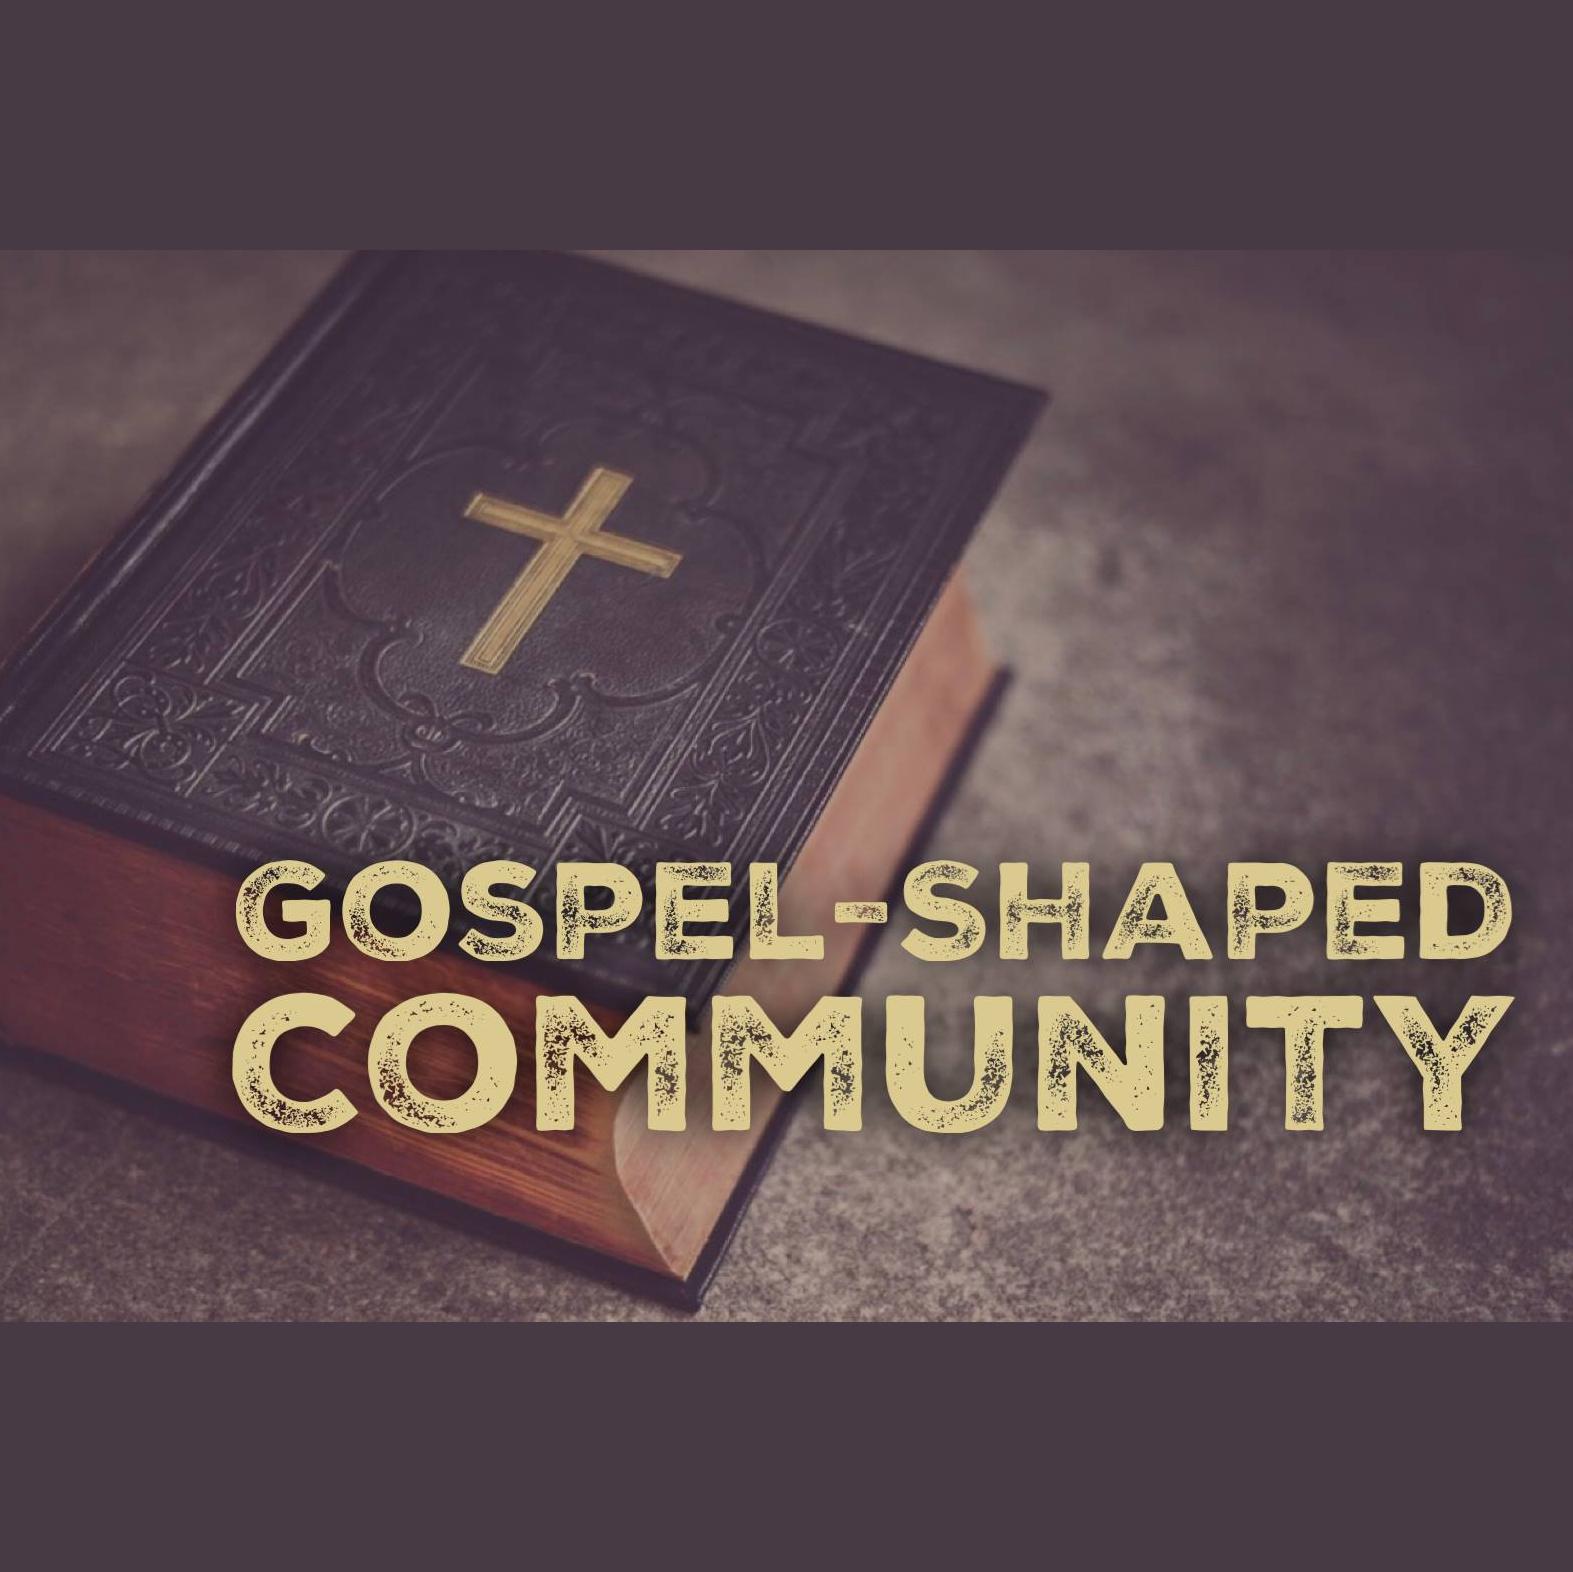 Gospel-Shaped Community